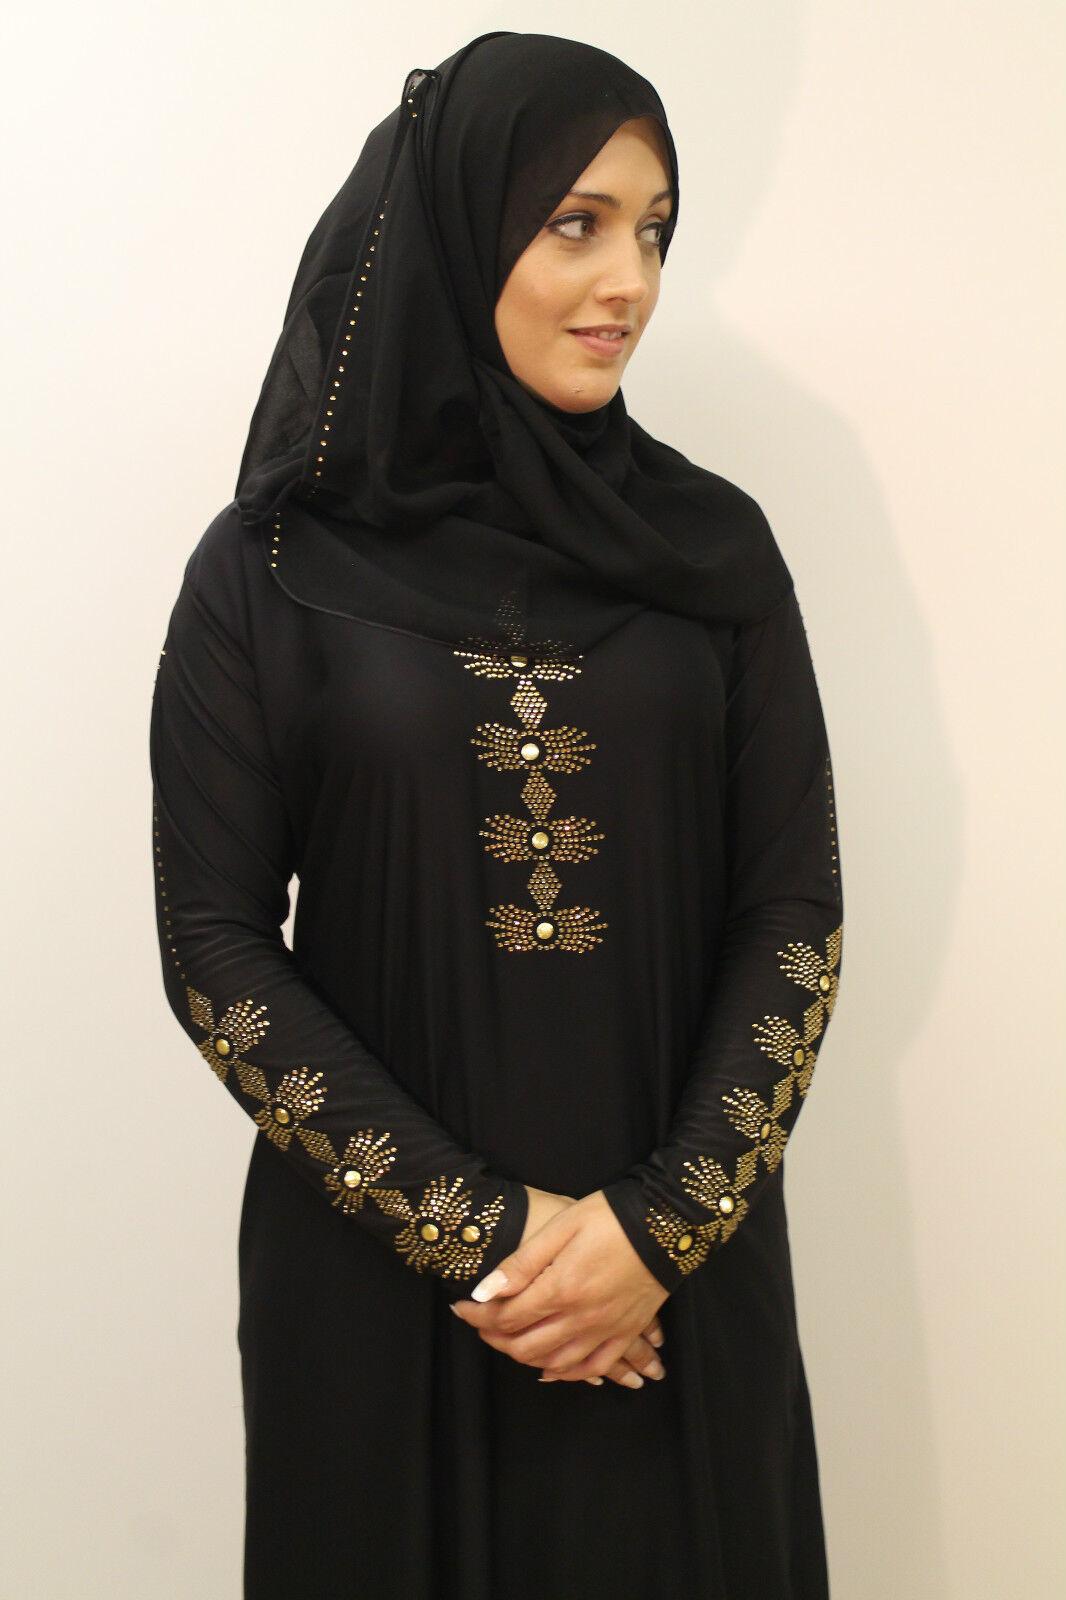 Ladies Sequin Jewel Beaded Embroidery Designer Jilbab Bridal Abaya Hijab Dress